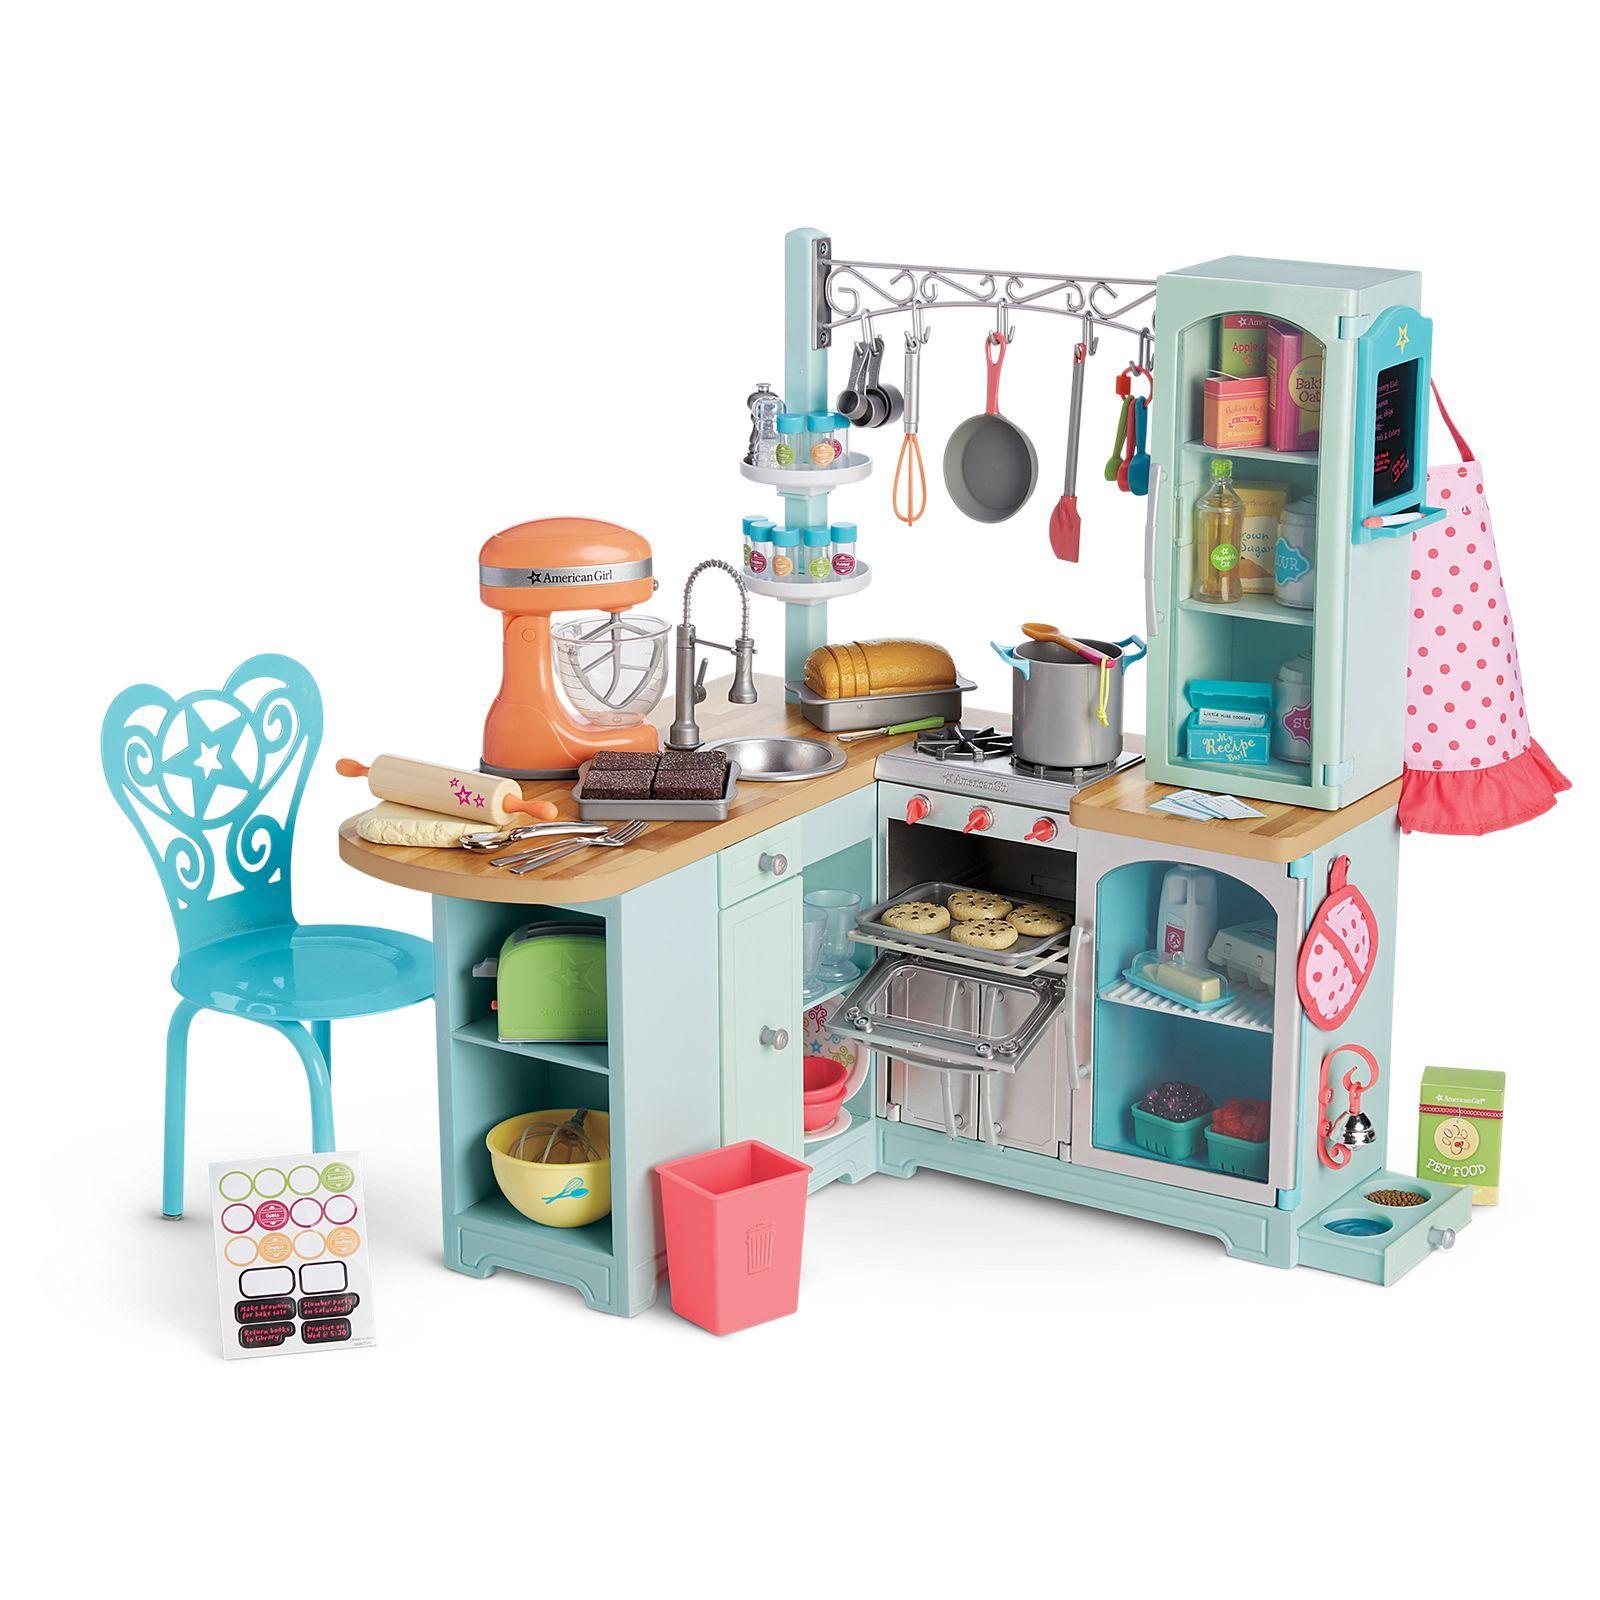 Gourmet kitchen set my american girl doll american girl dolls